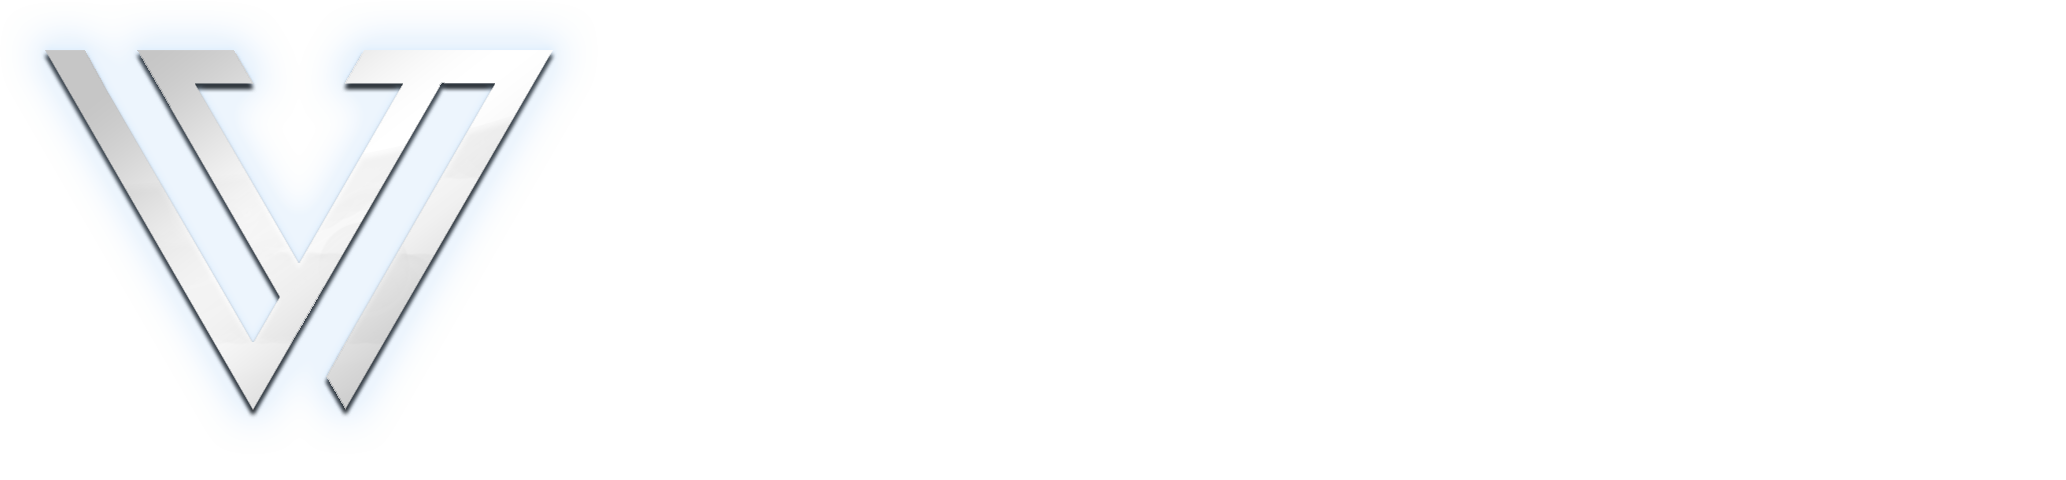 Vuild